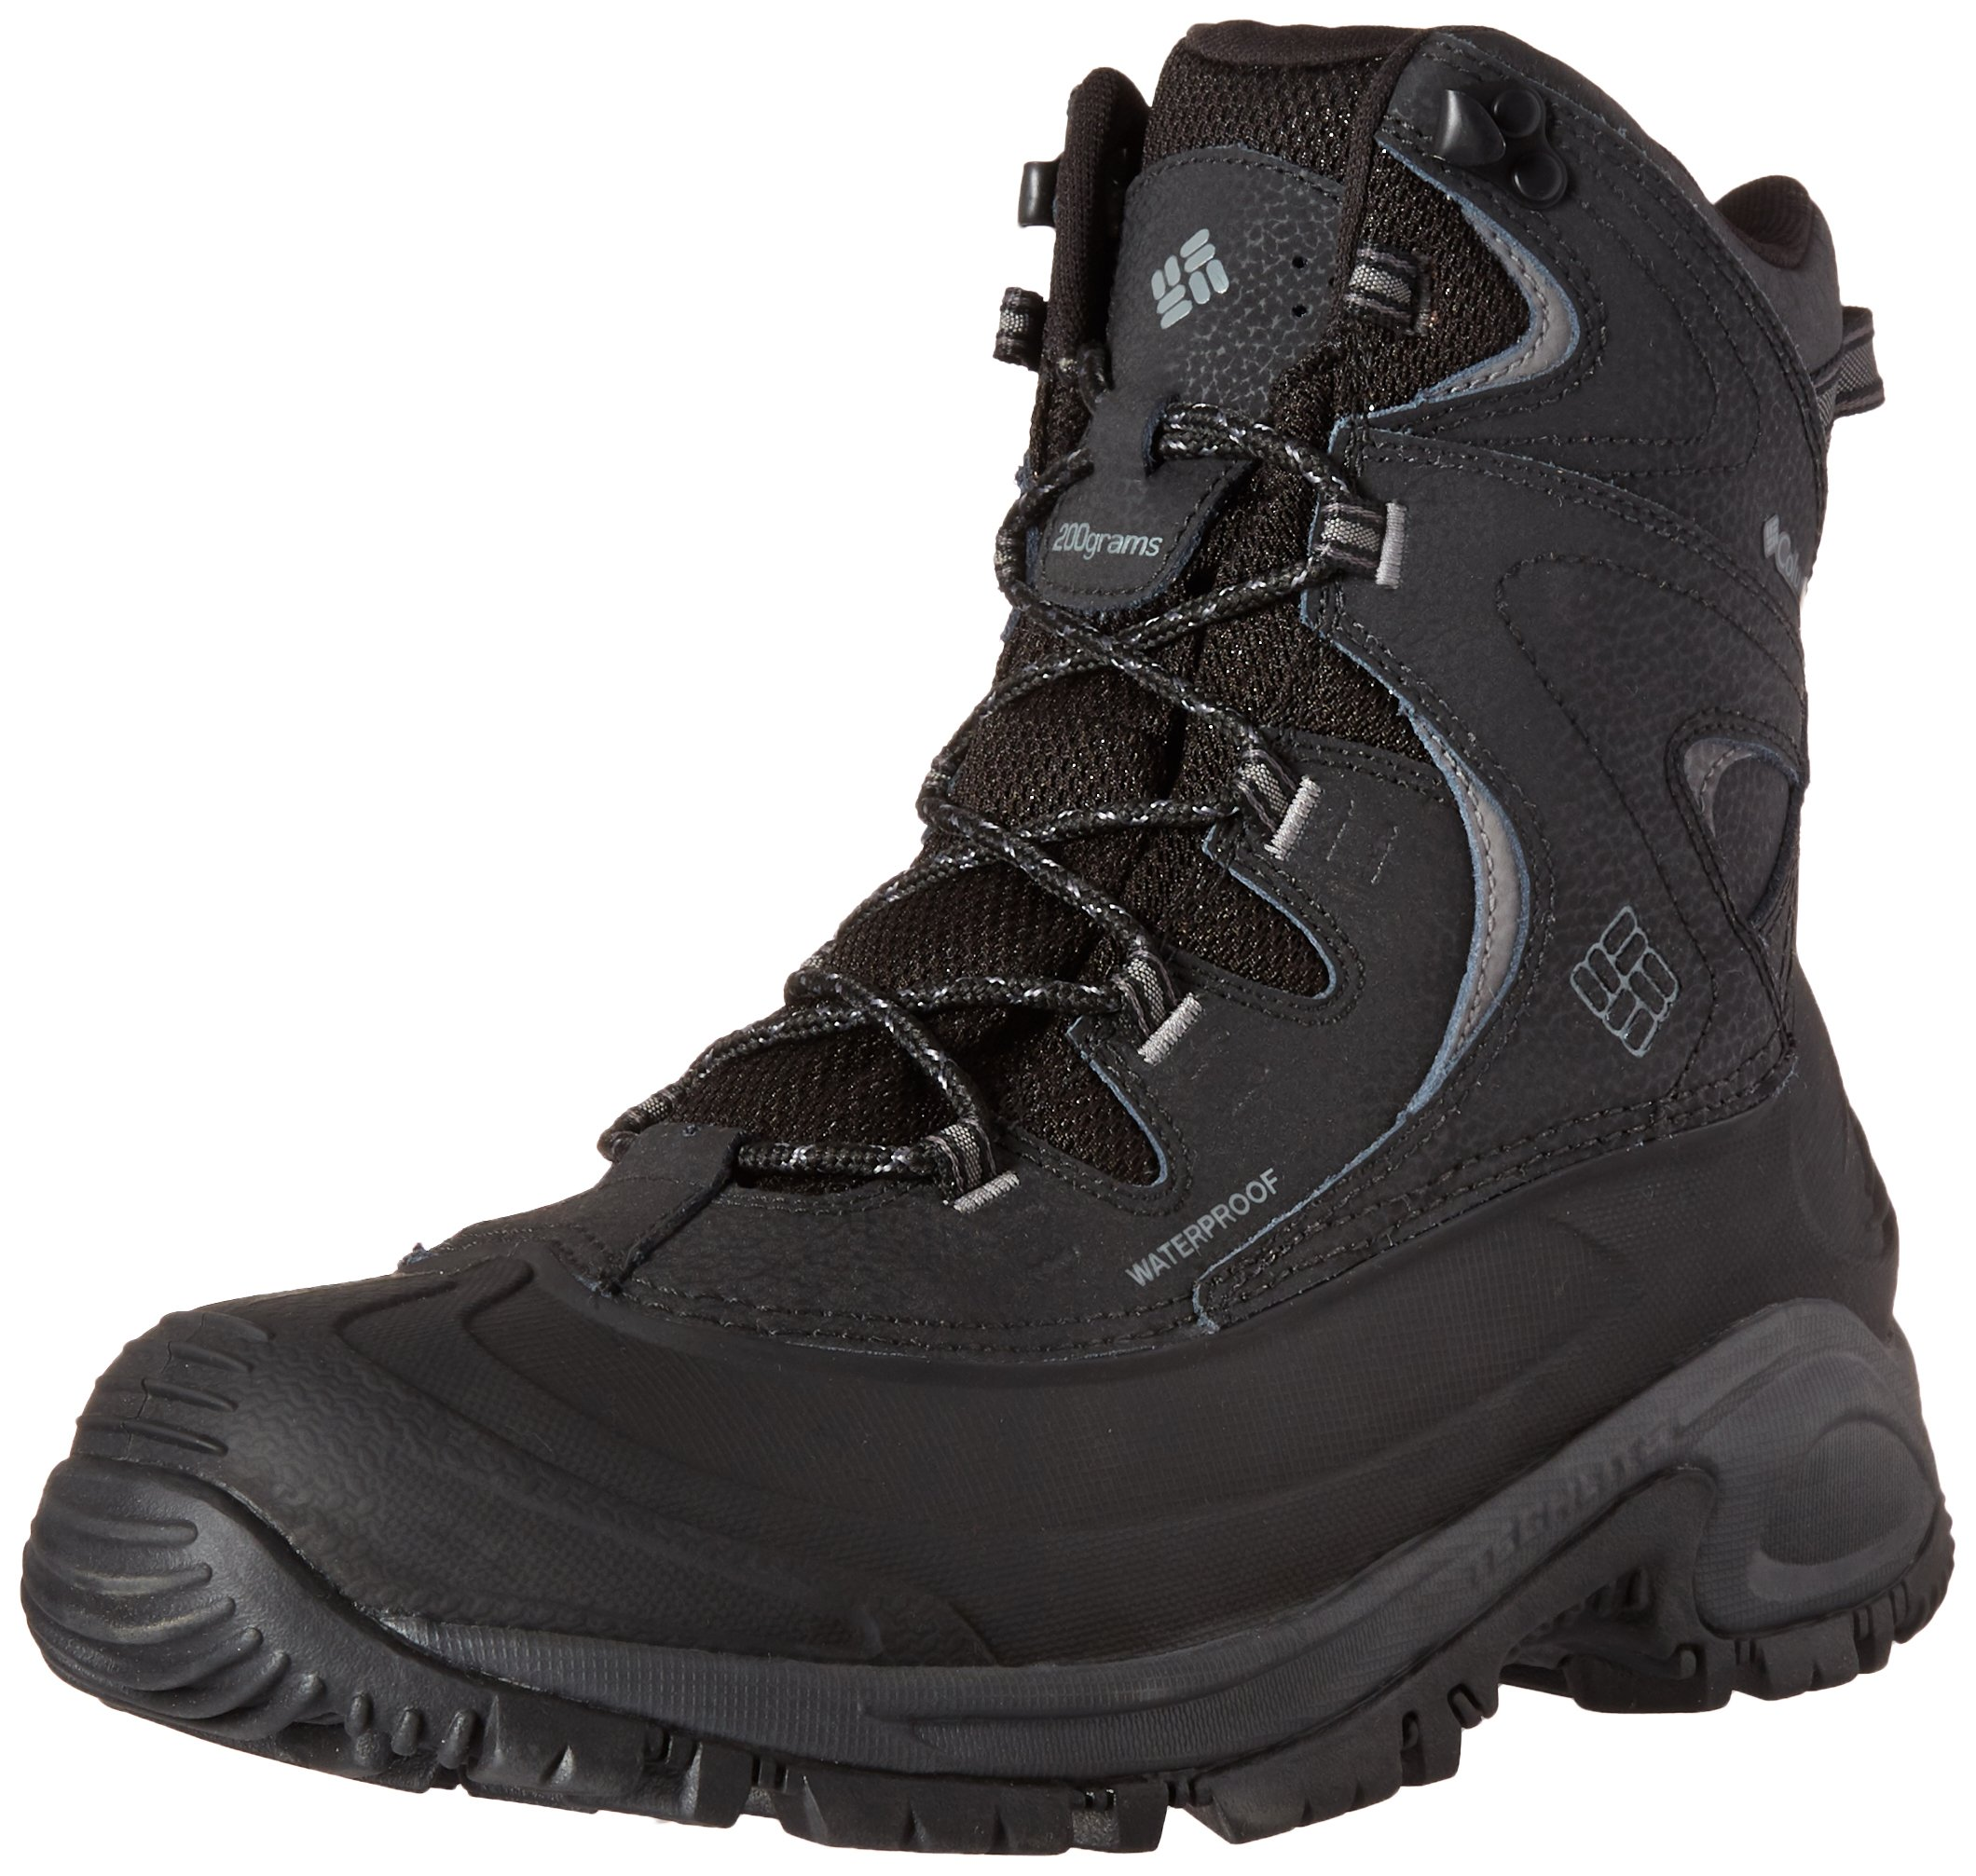 Columbia Men's Bugaboot Ii Wide Snow Boot, Black, Charcoal, 11 2E US